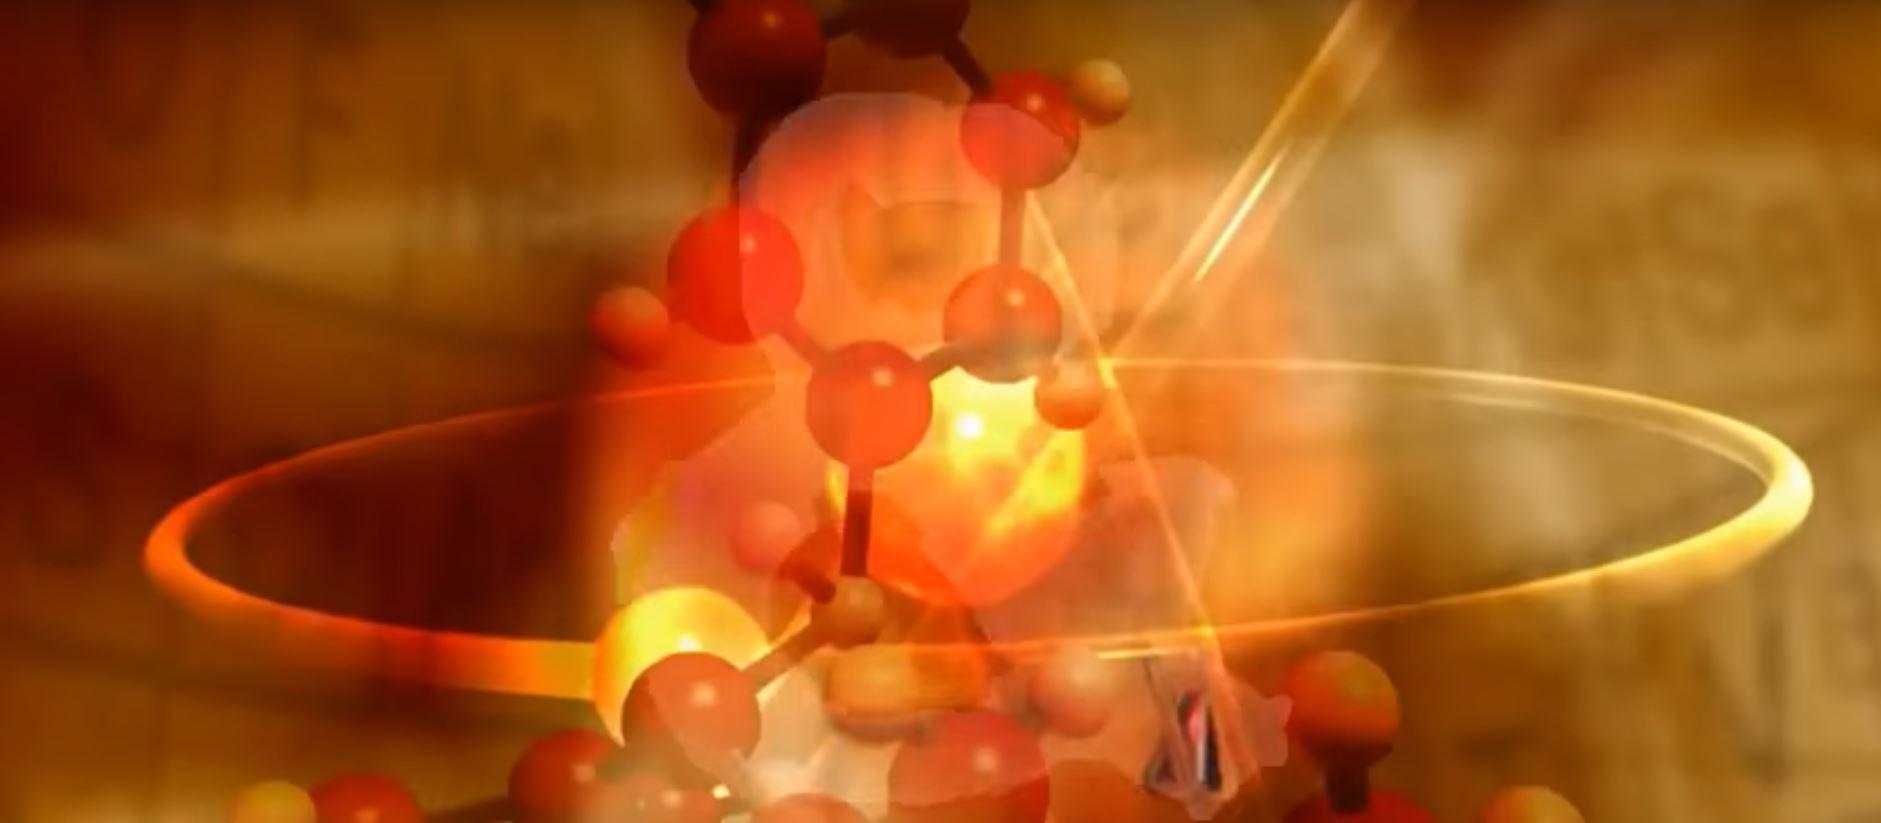 Серебряно-цинковые микробатареи: гигантский шаг вперед для небольших приложений